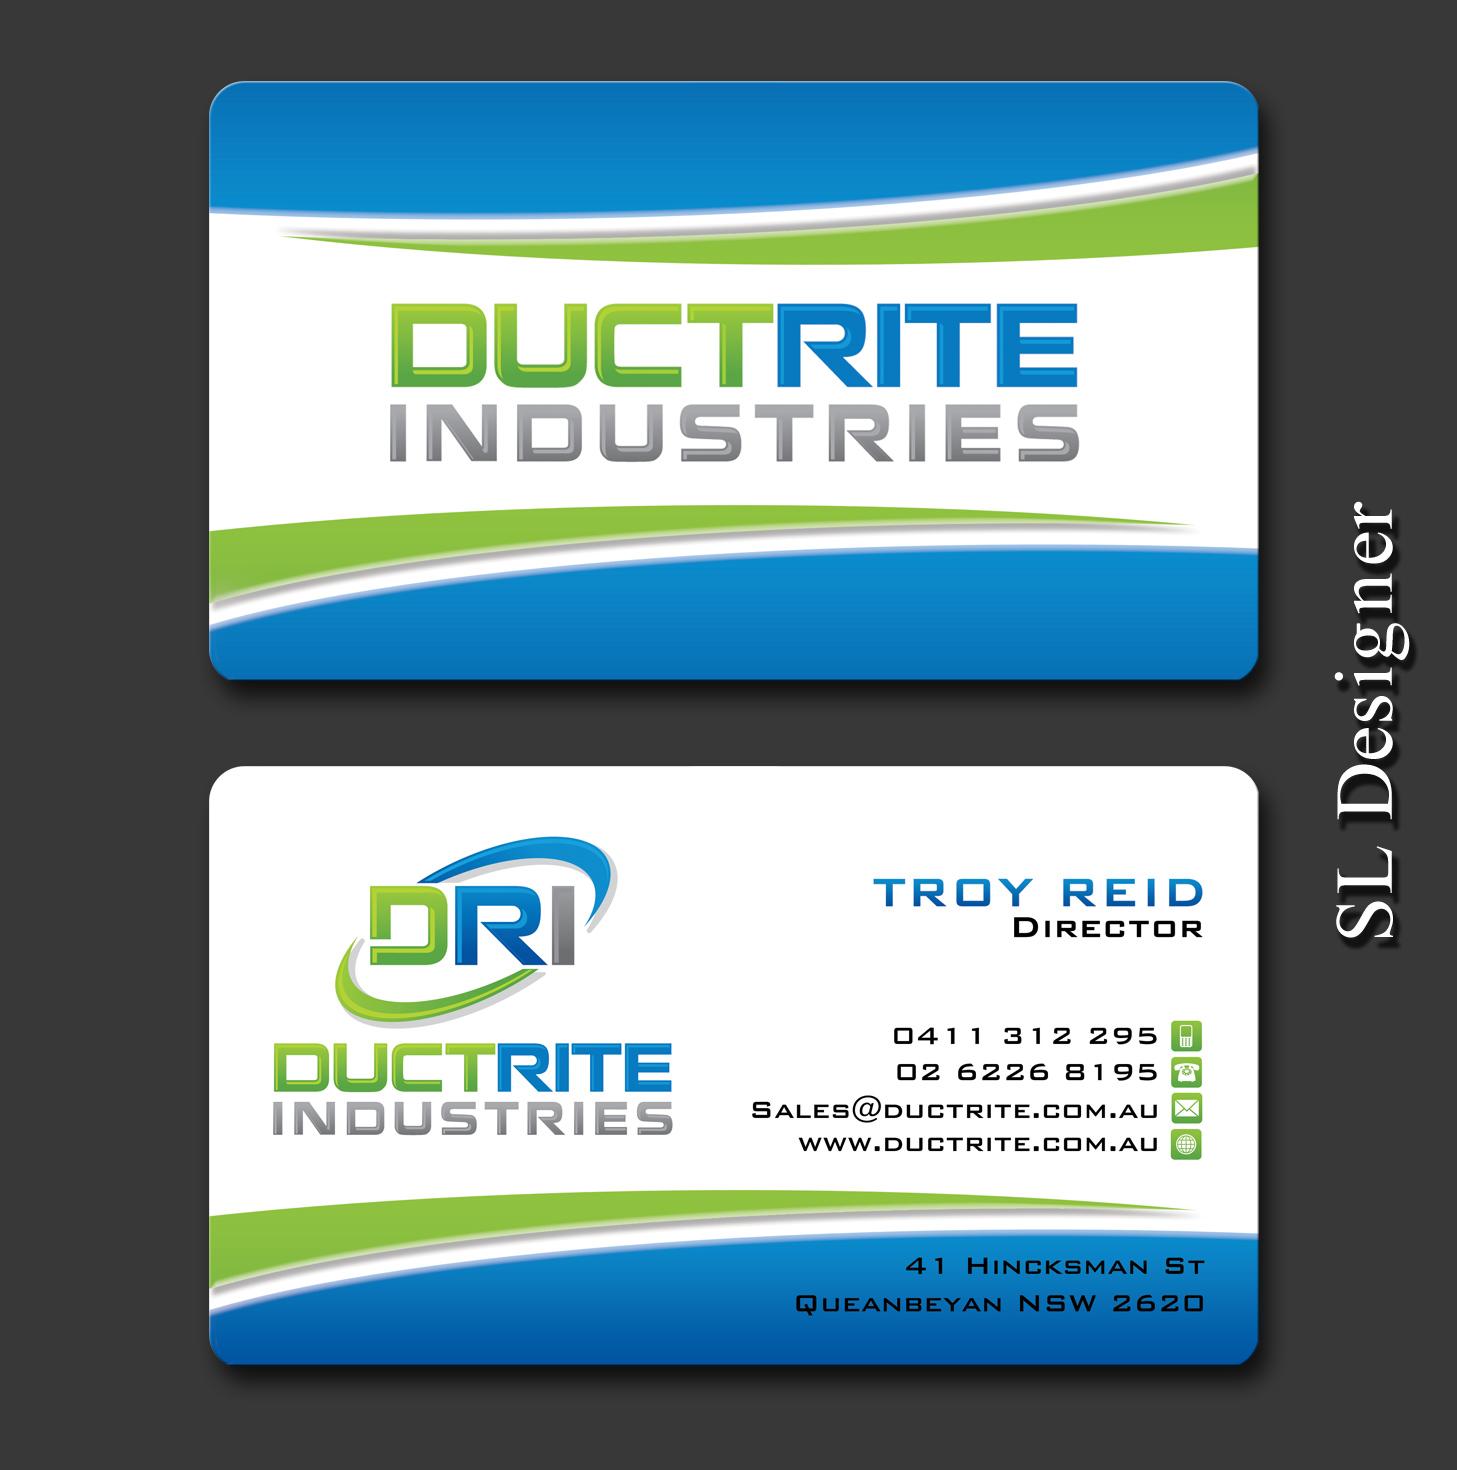 151 Serious Business Card Designs | Business Business Card Design ...